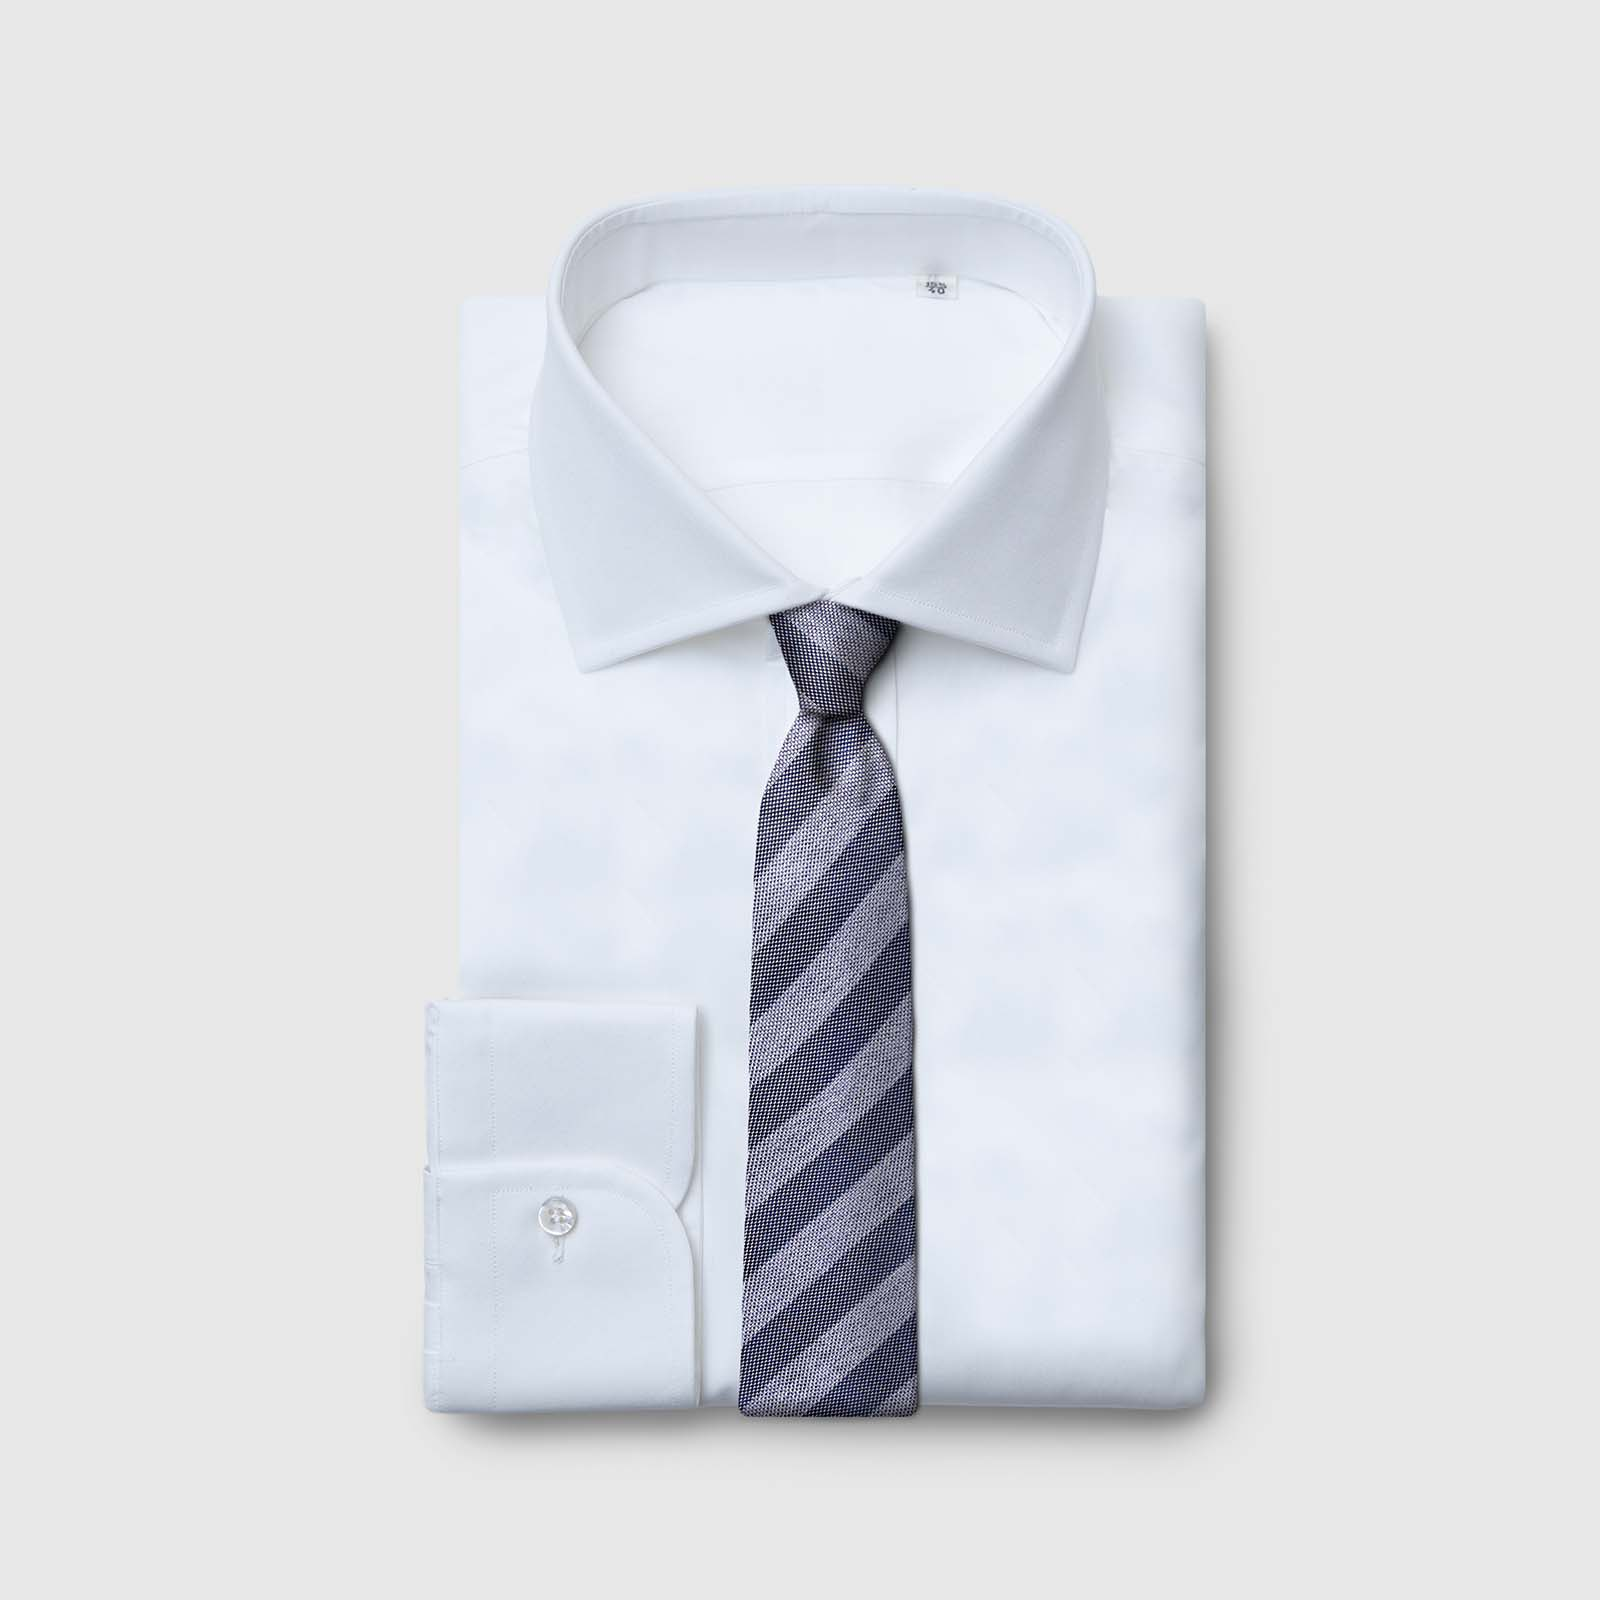 Cravatta 5 Pieghe tessuta a righe fondo grigio